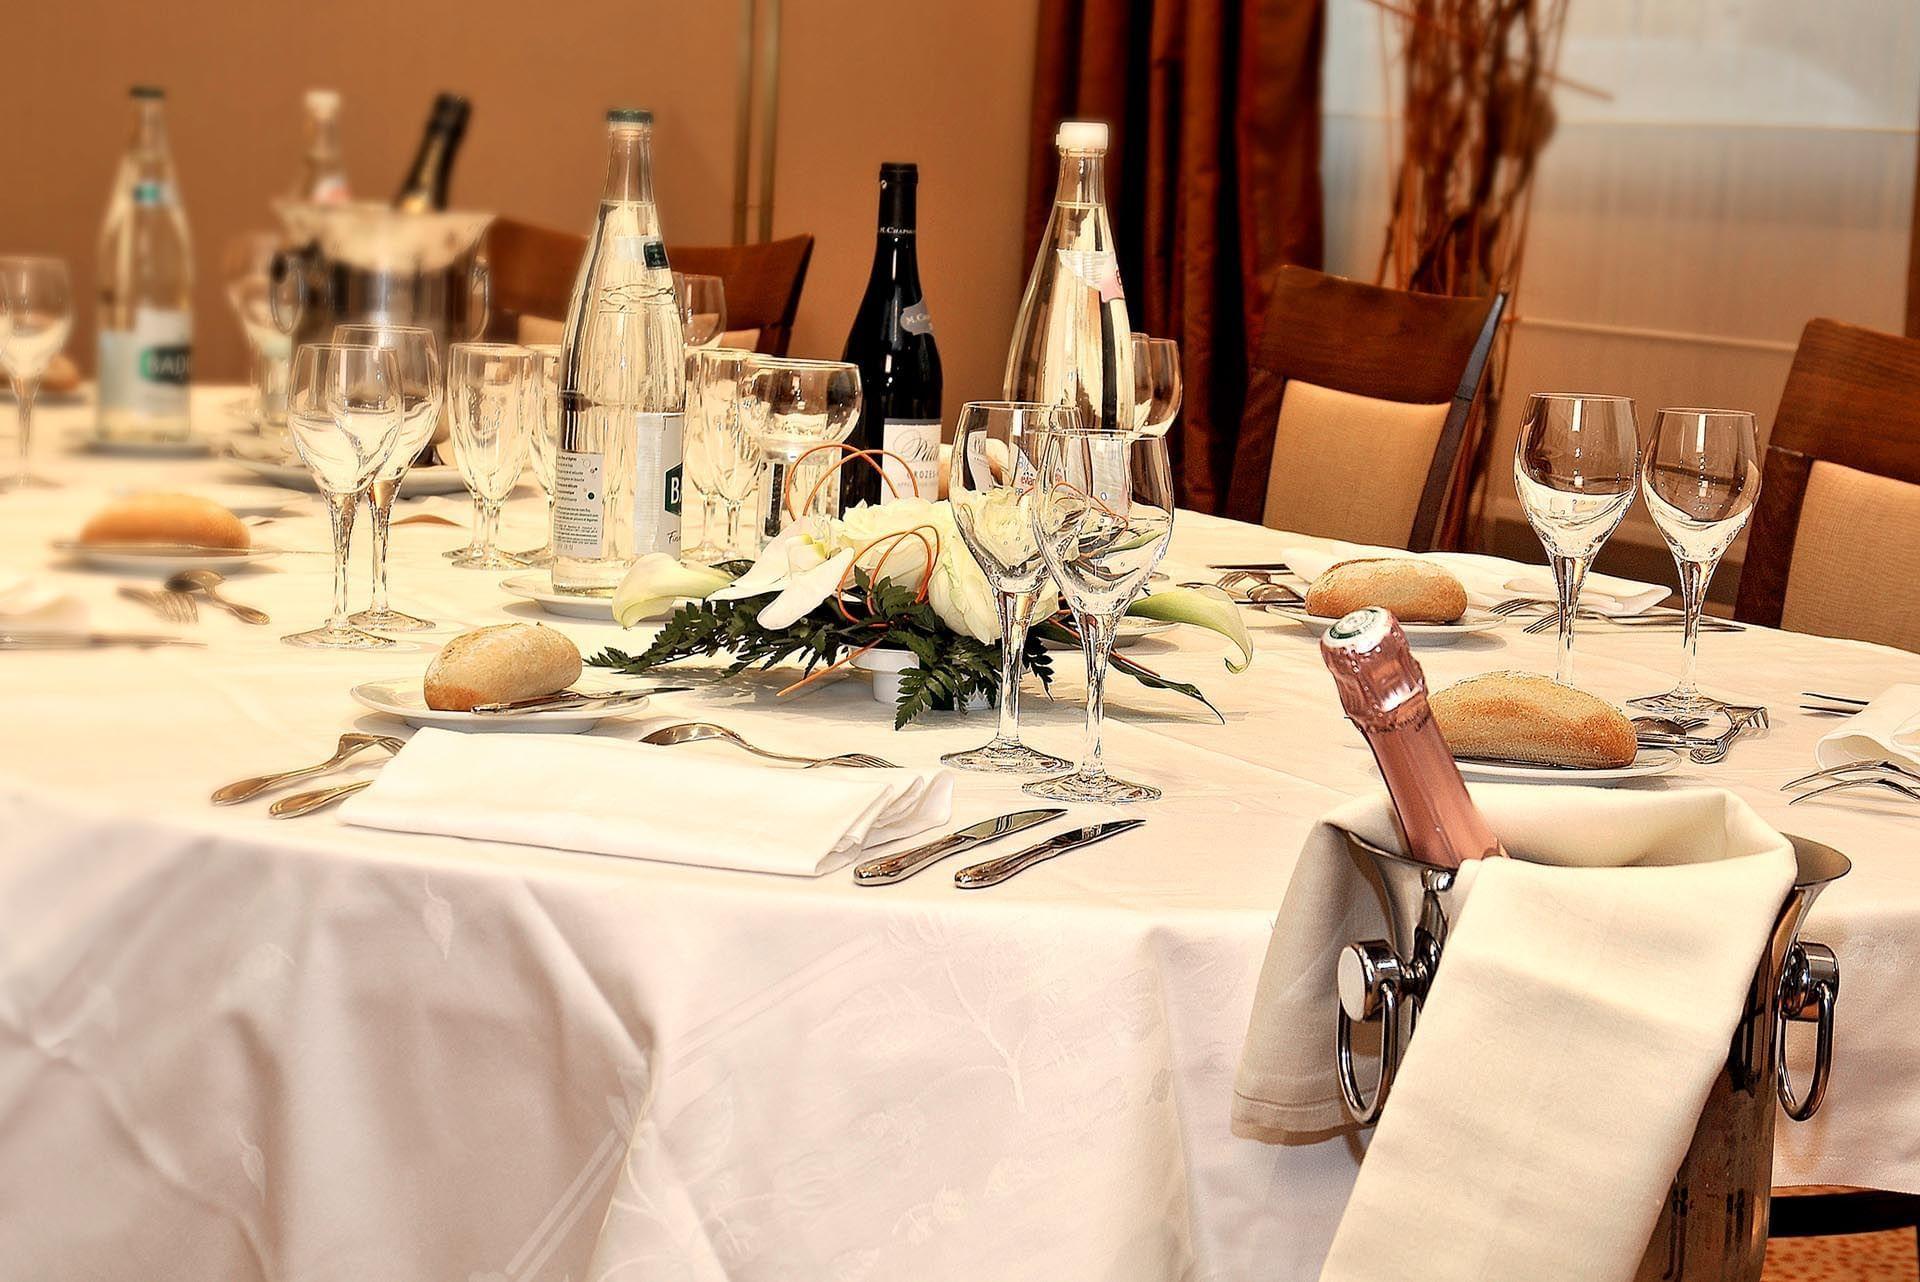 Banquet close-up